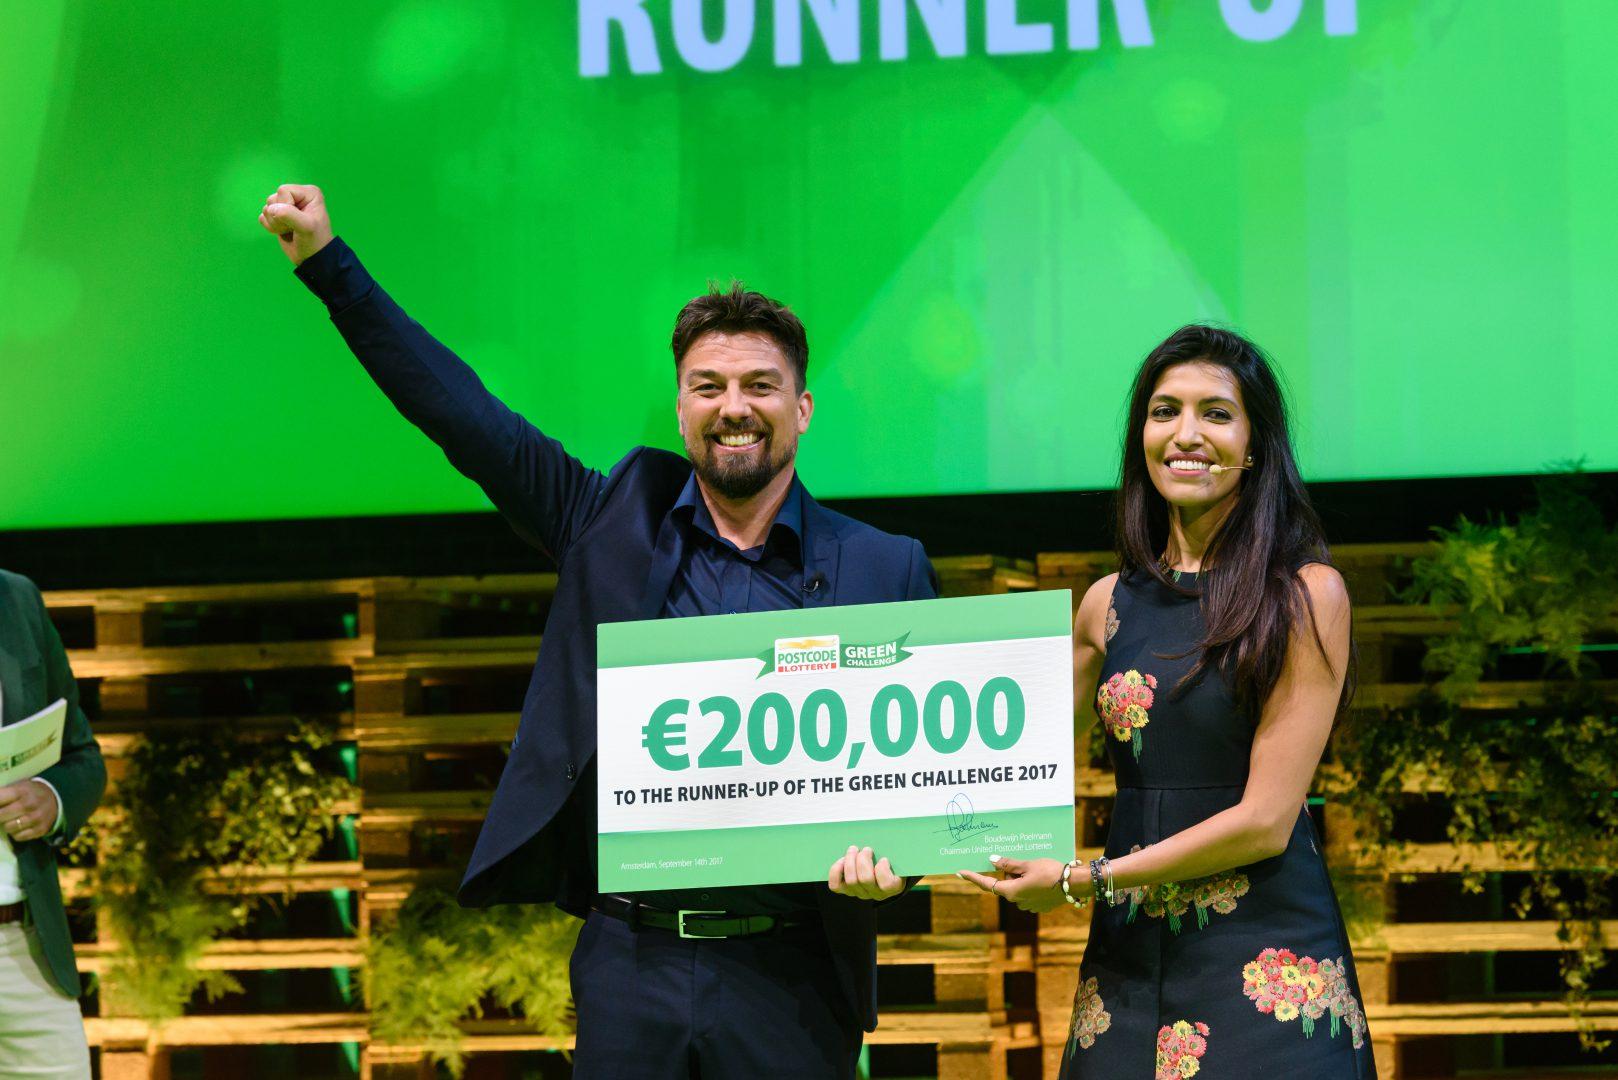 Green Challenge 2017